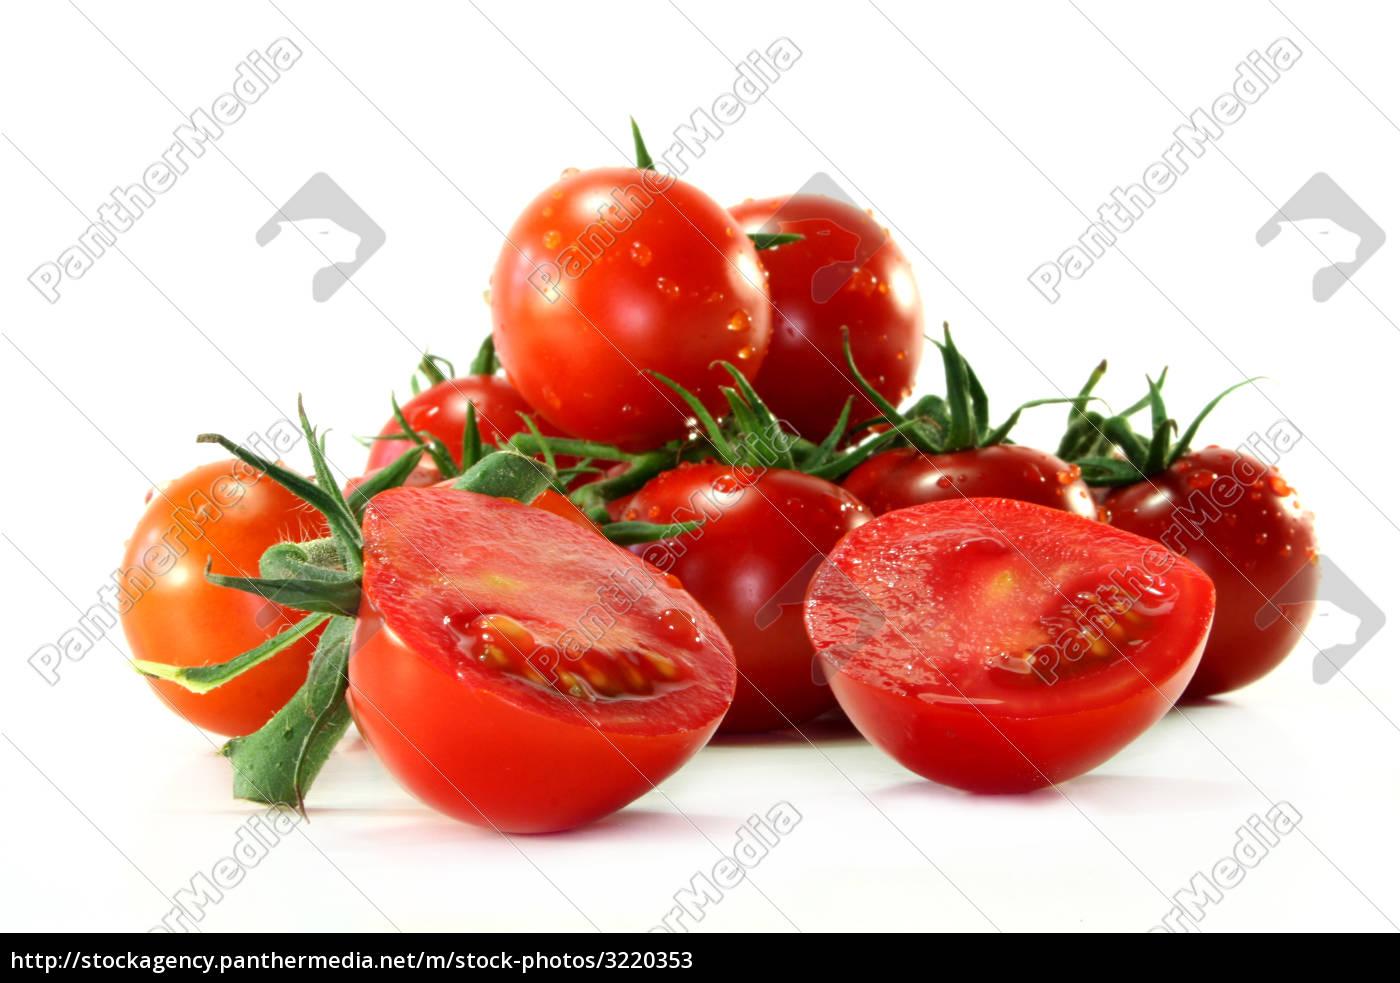 tomatoes - 3220353